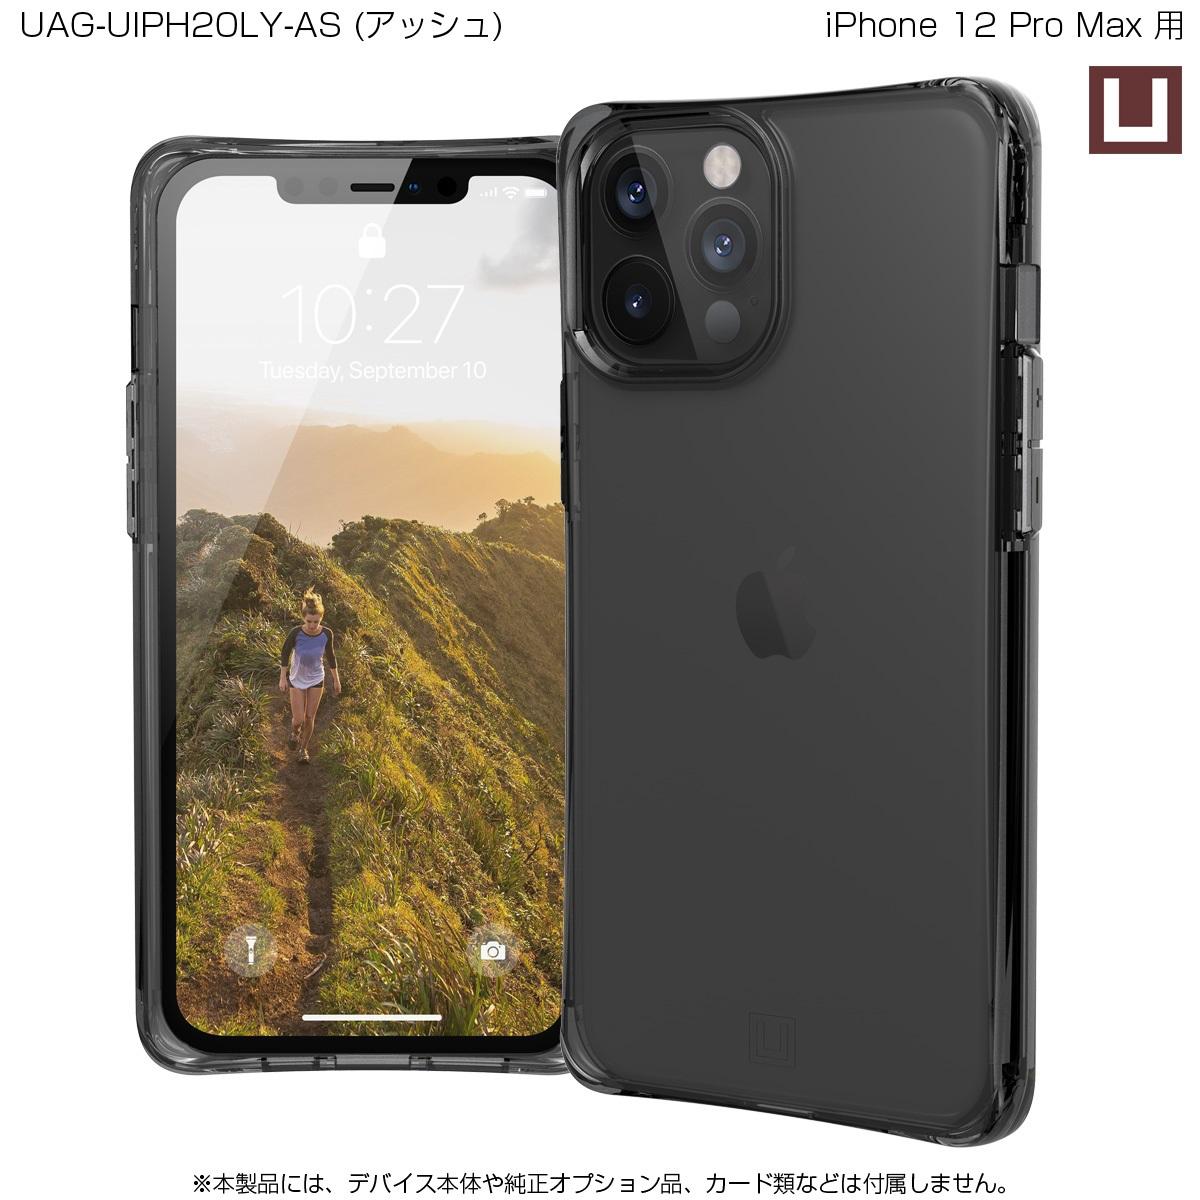 U by UAG iPhone 12 Pro Max用 MOUVEケース 全4色 耐衝撃 UAG-UIPH20LYシリーズ 6.7インチ